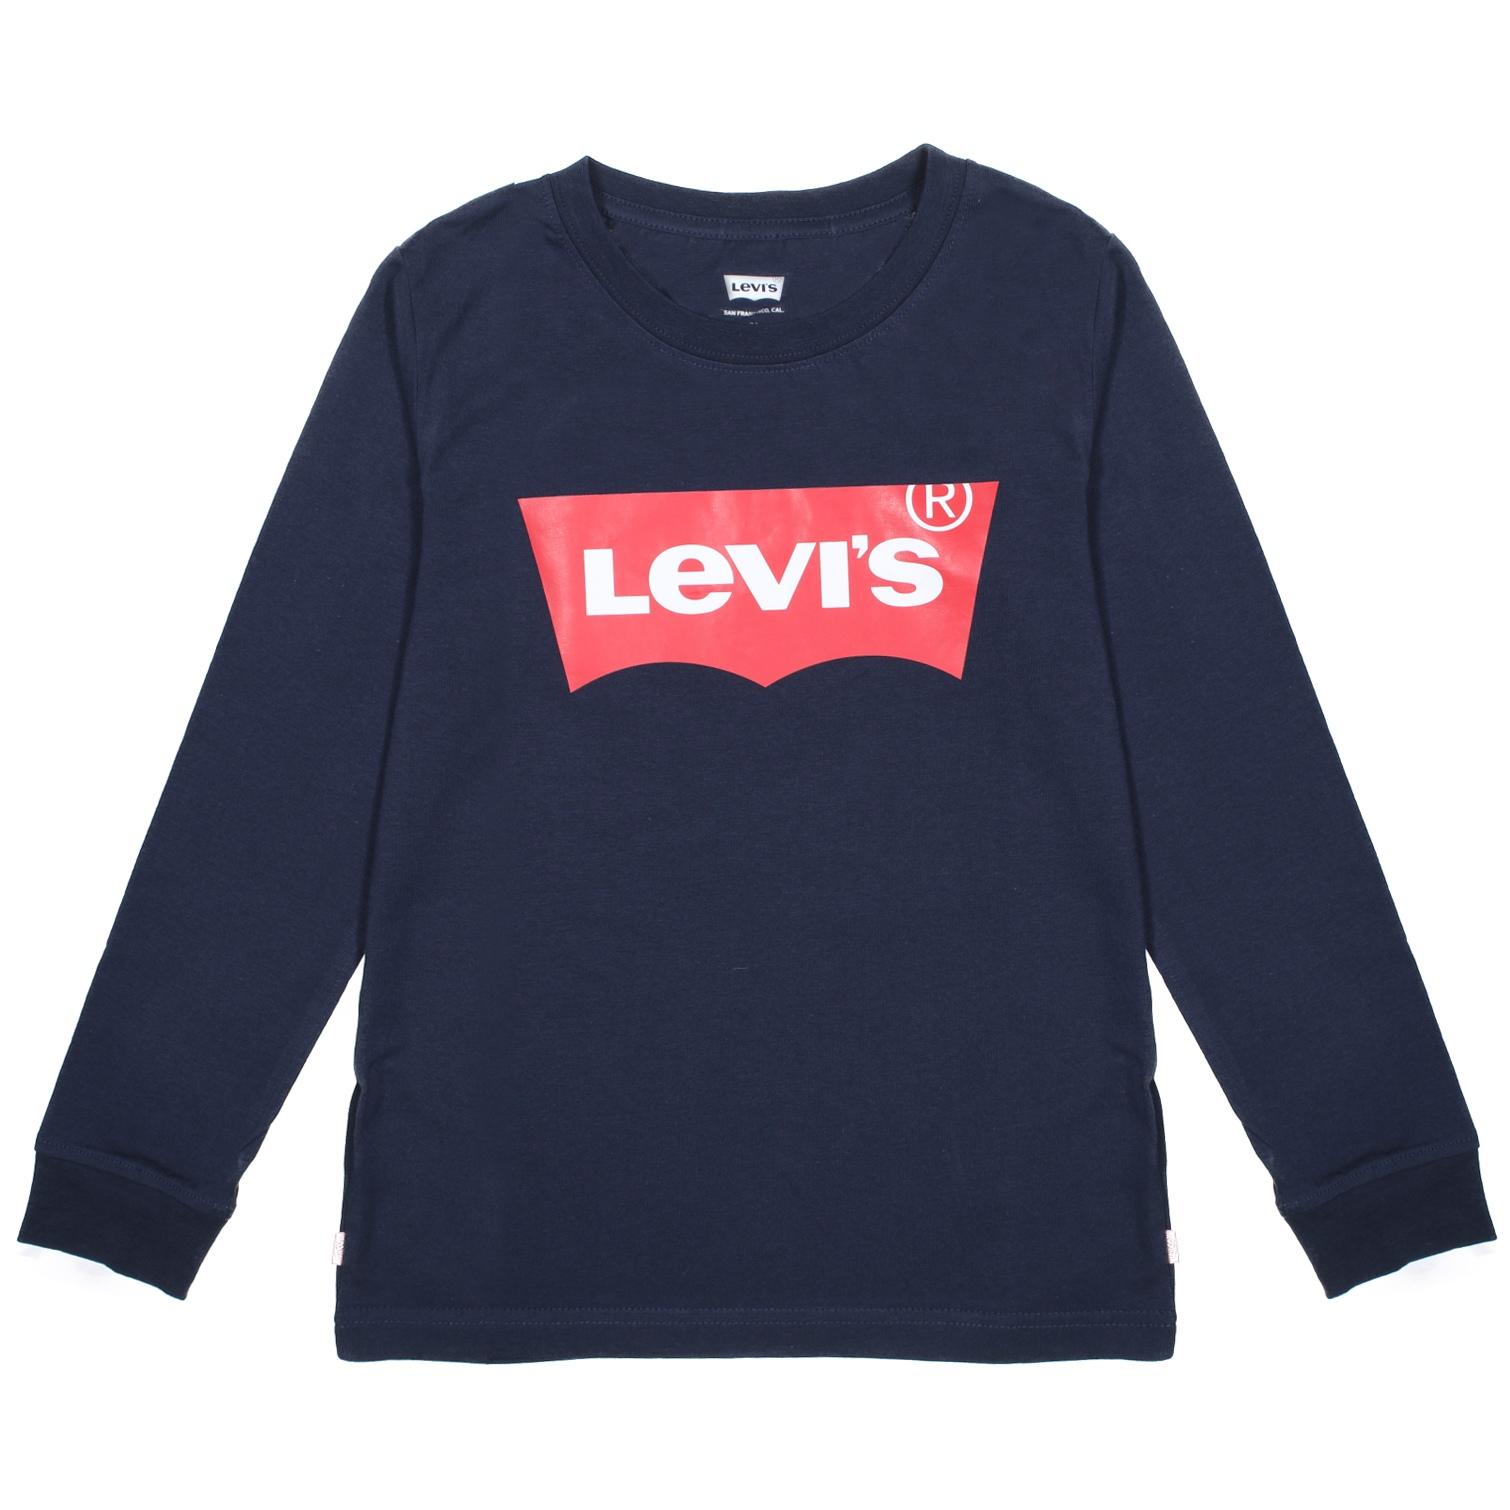 http://www.leadermode.com/183713/levi-s-kids-8646-u09-dress-blue.jpg